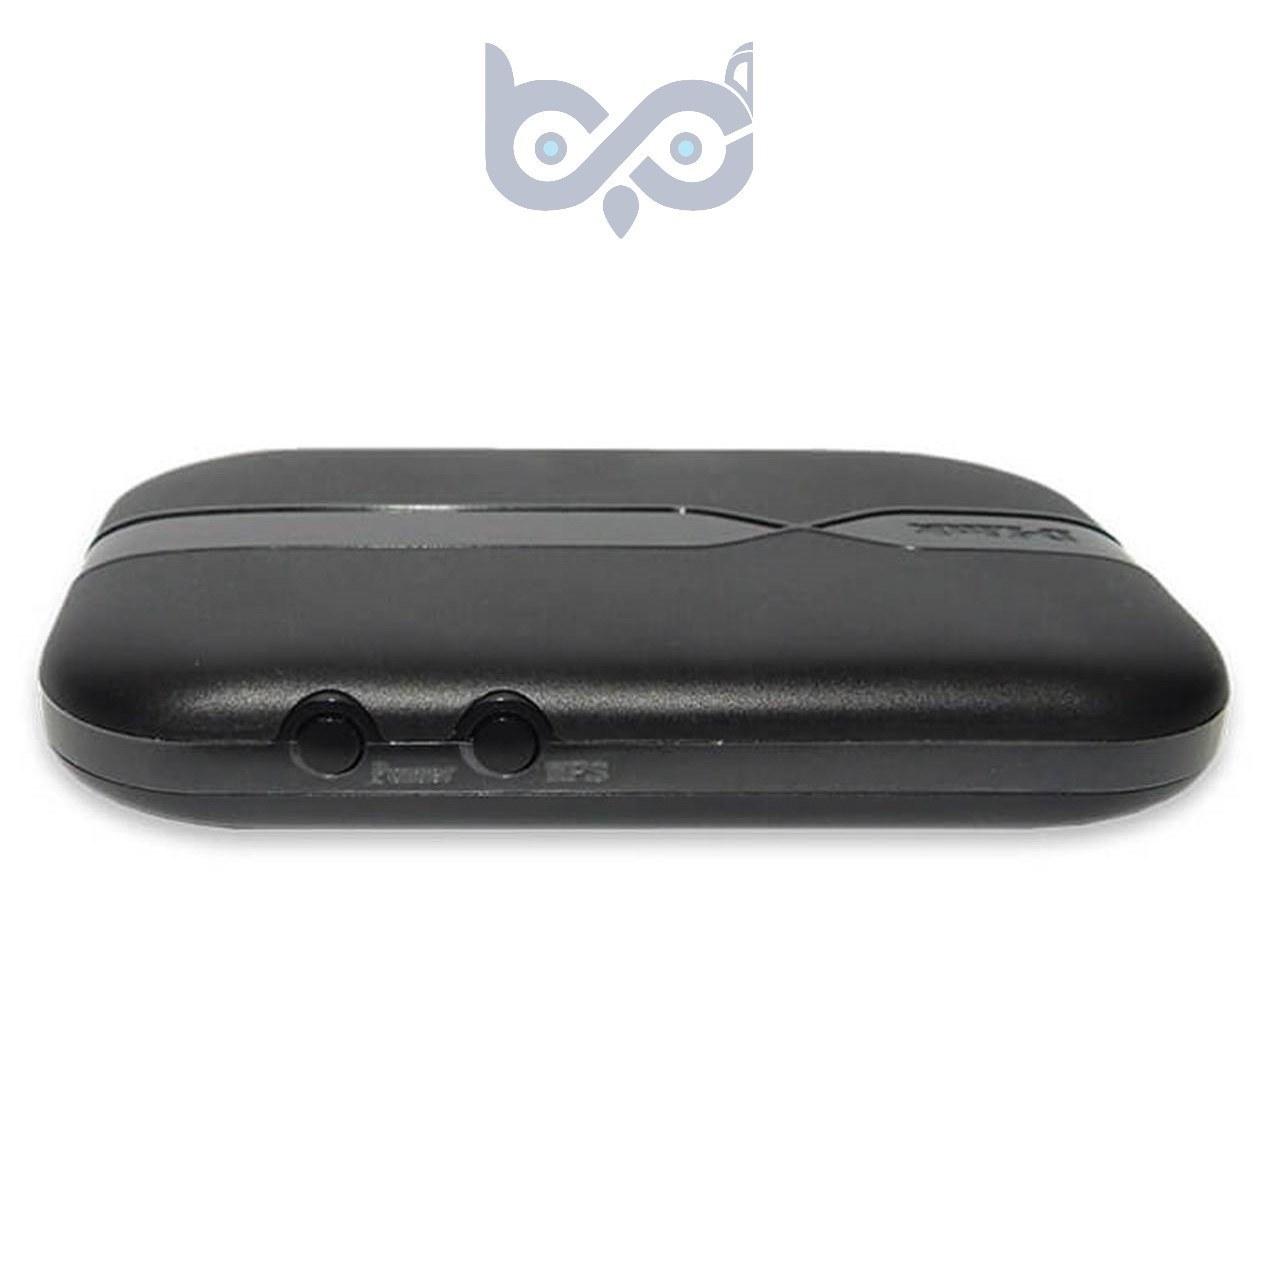 تصویر D-Link DWR-932C E1 N300 4G/LTE WiFi Mobile Modem Router مودم ۴G قابل حمل دی-لینک مدل دی دبلیو آر ۹۳۲ سی ای ۱